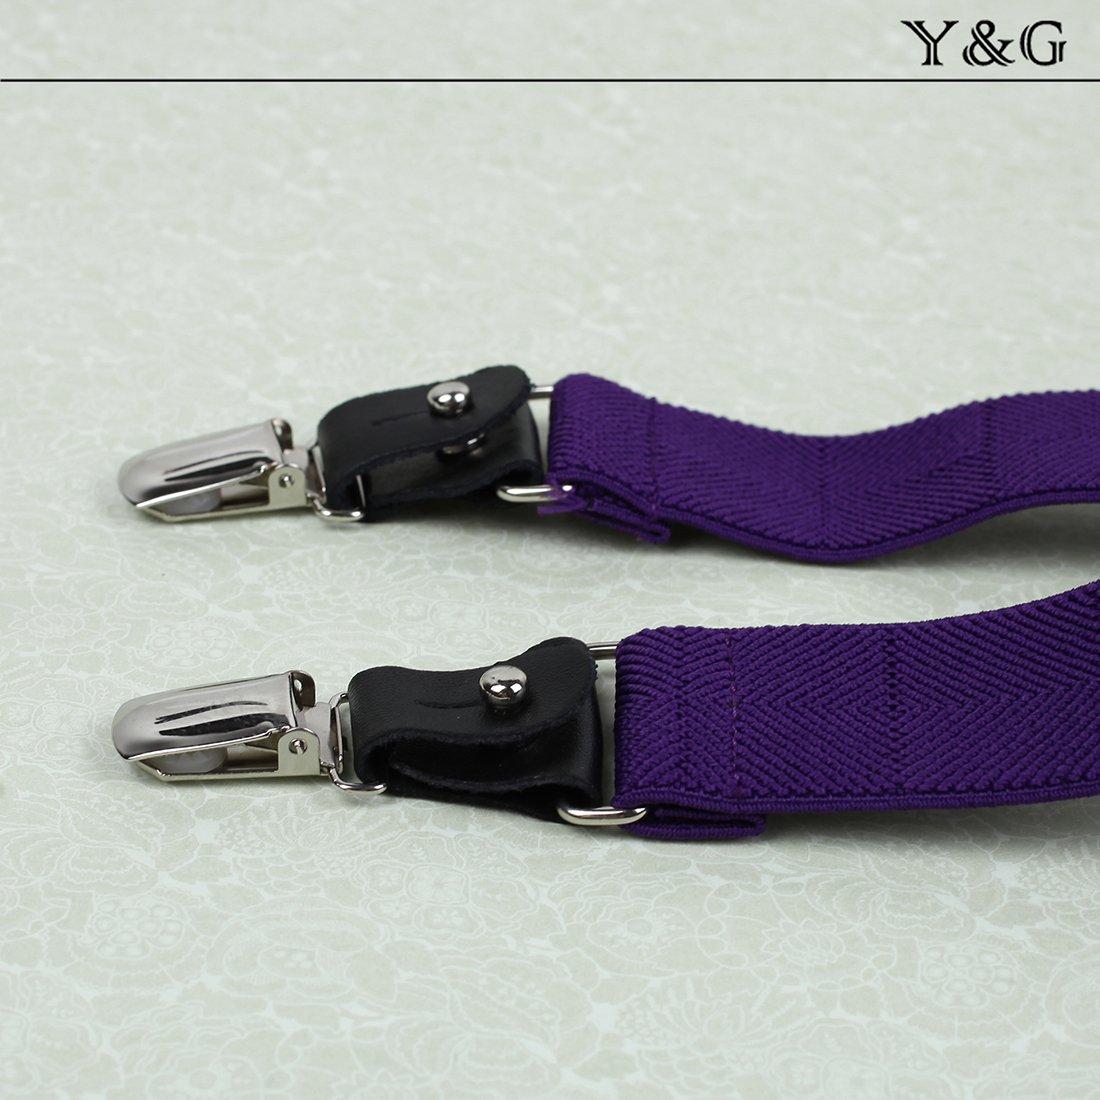 Y/&G Mens Fashion Fashion Multicoloured Suspenders Clip-end Brace Y-back SP2023